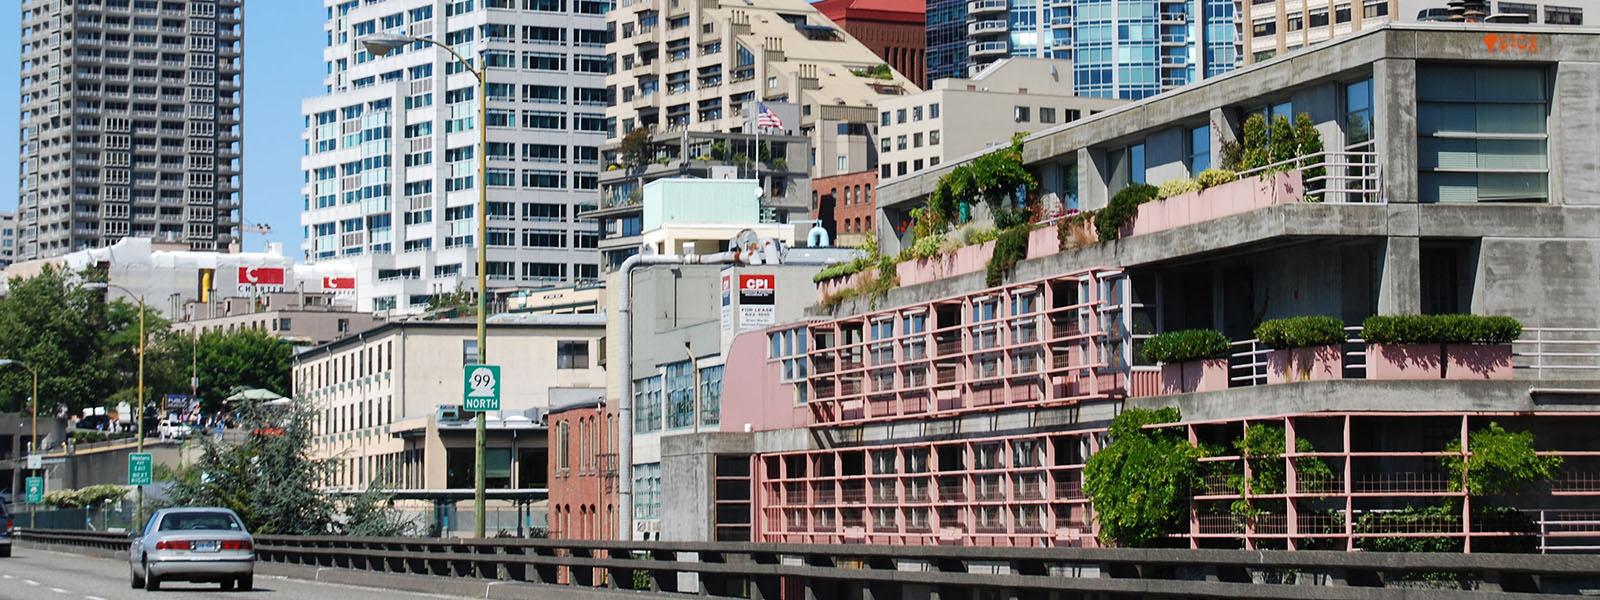 Market Court Condominiums - Pike Place, Seattle, Washington